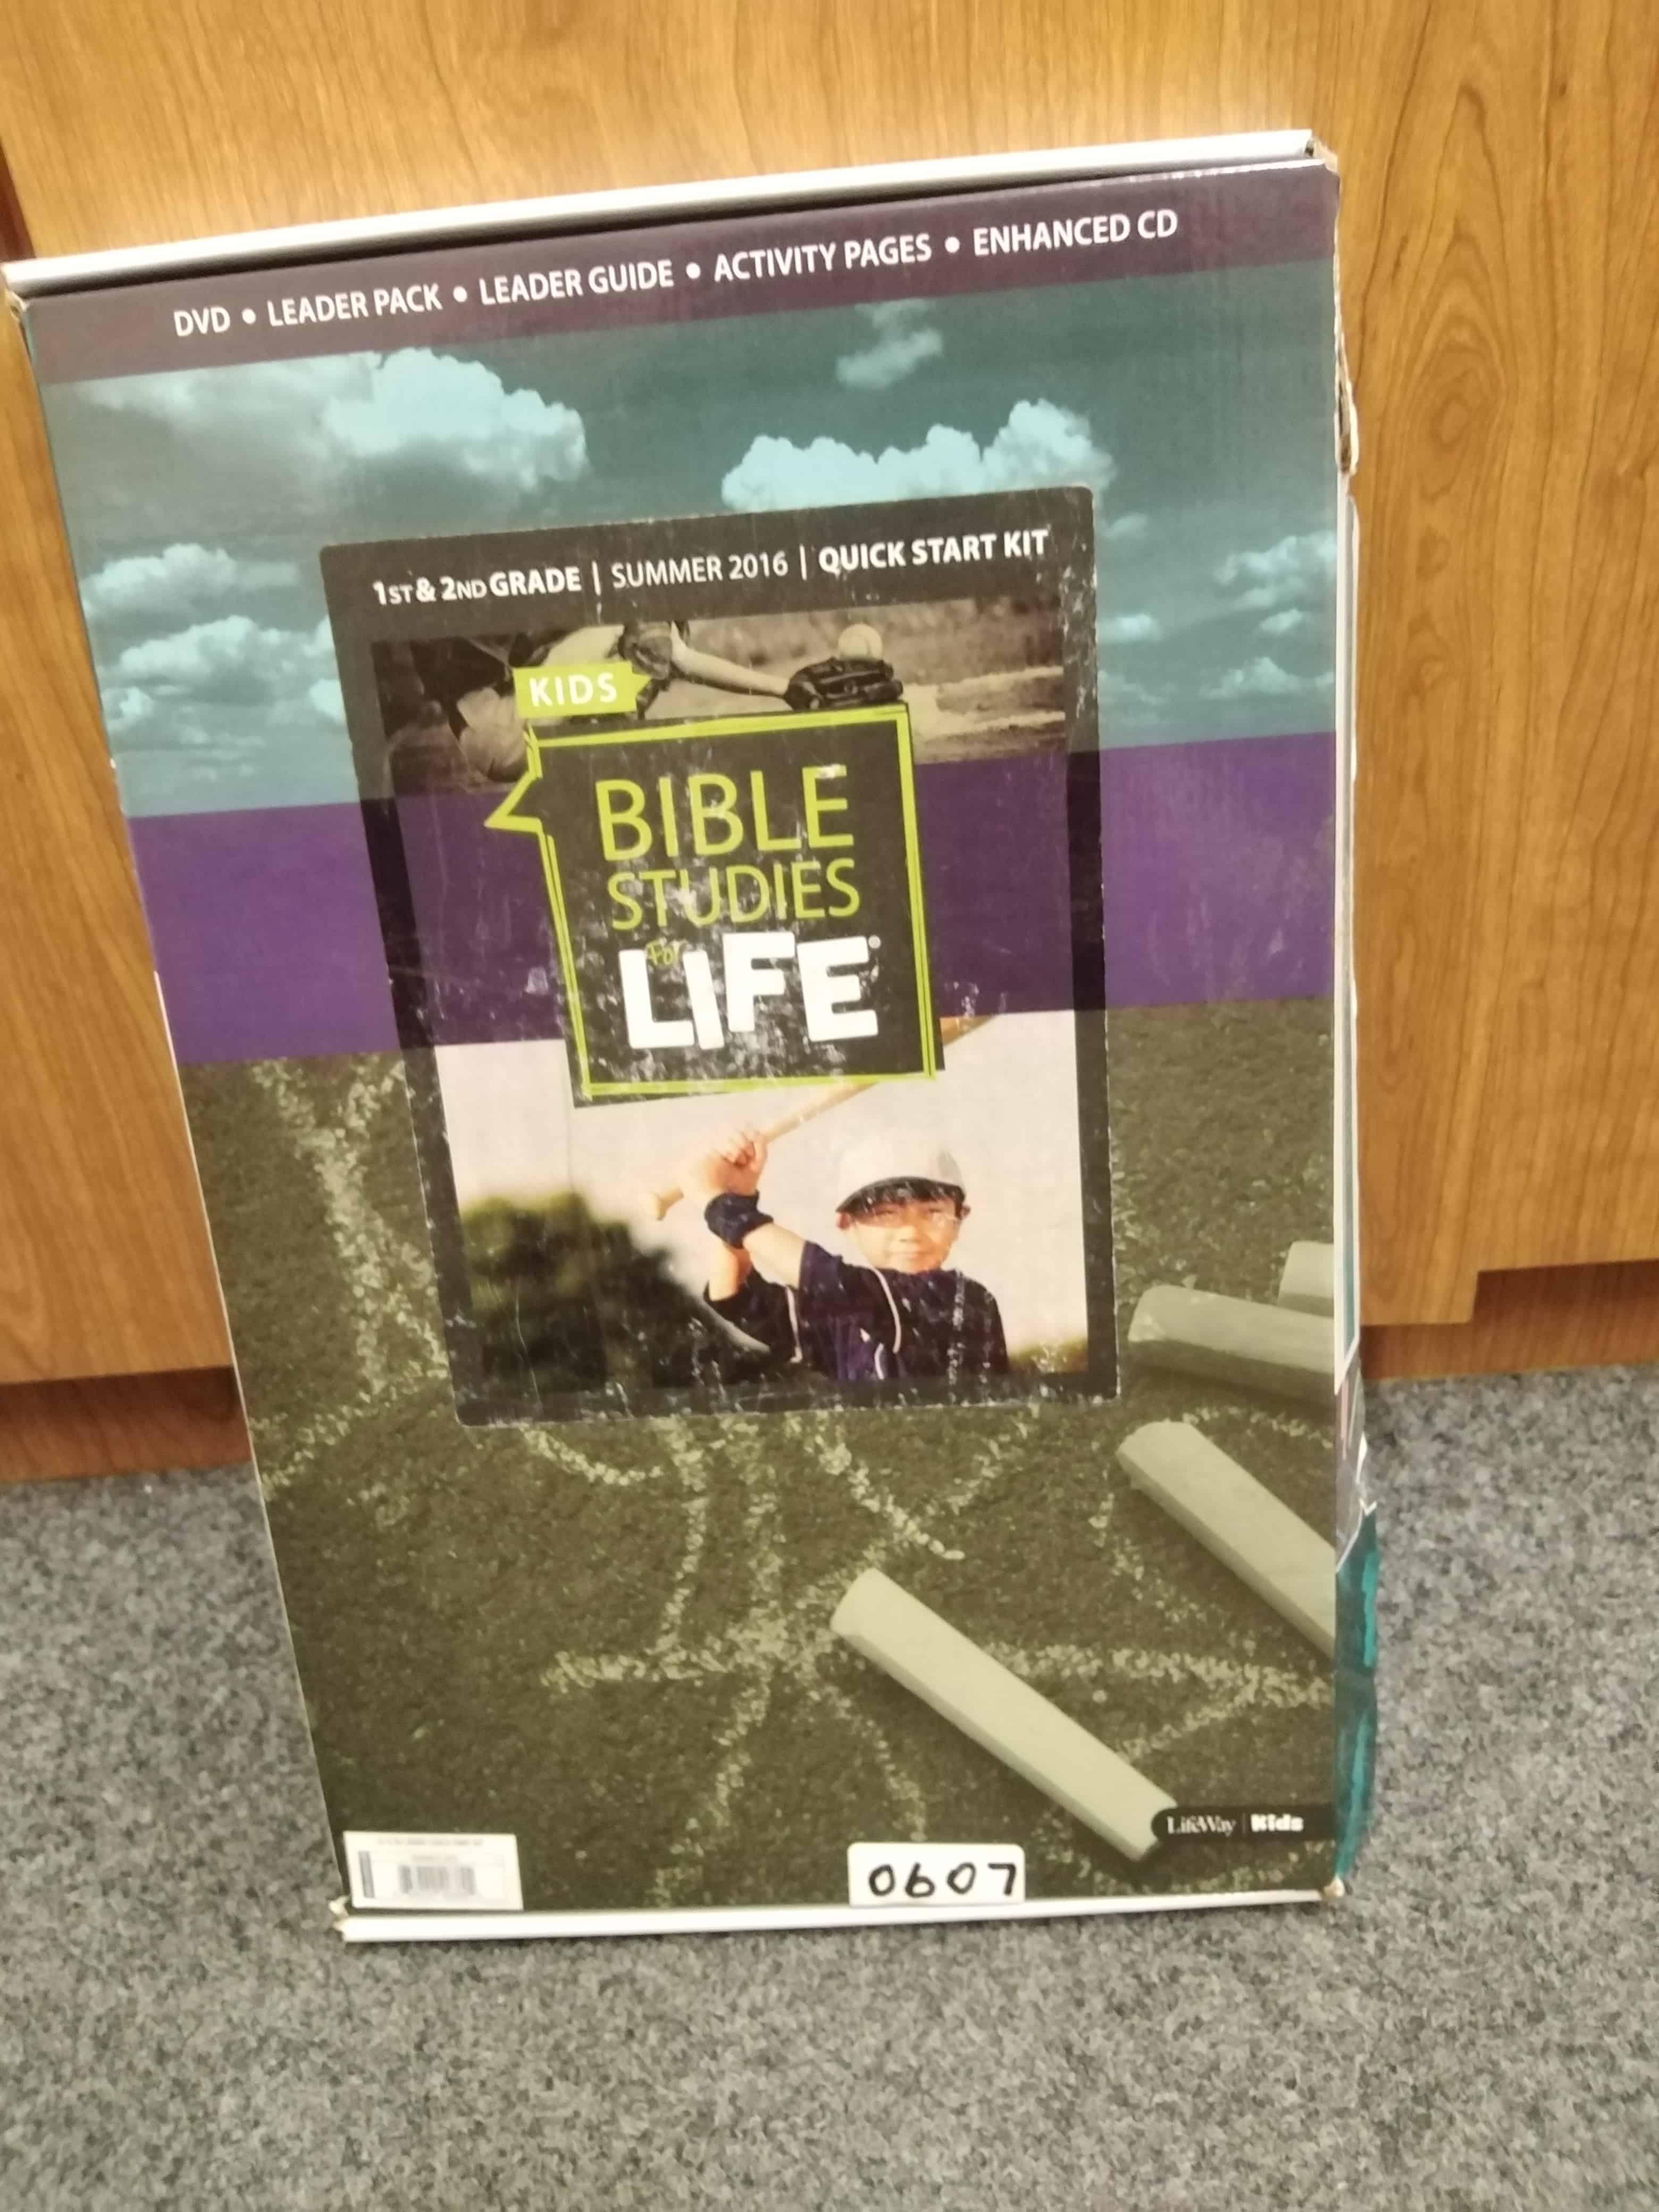 #0607 - Bible Study for Life Set (Gr 1&2)